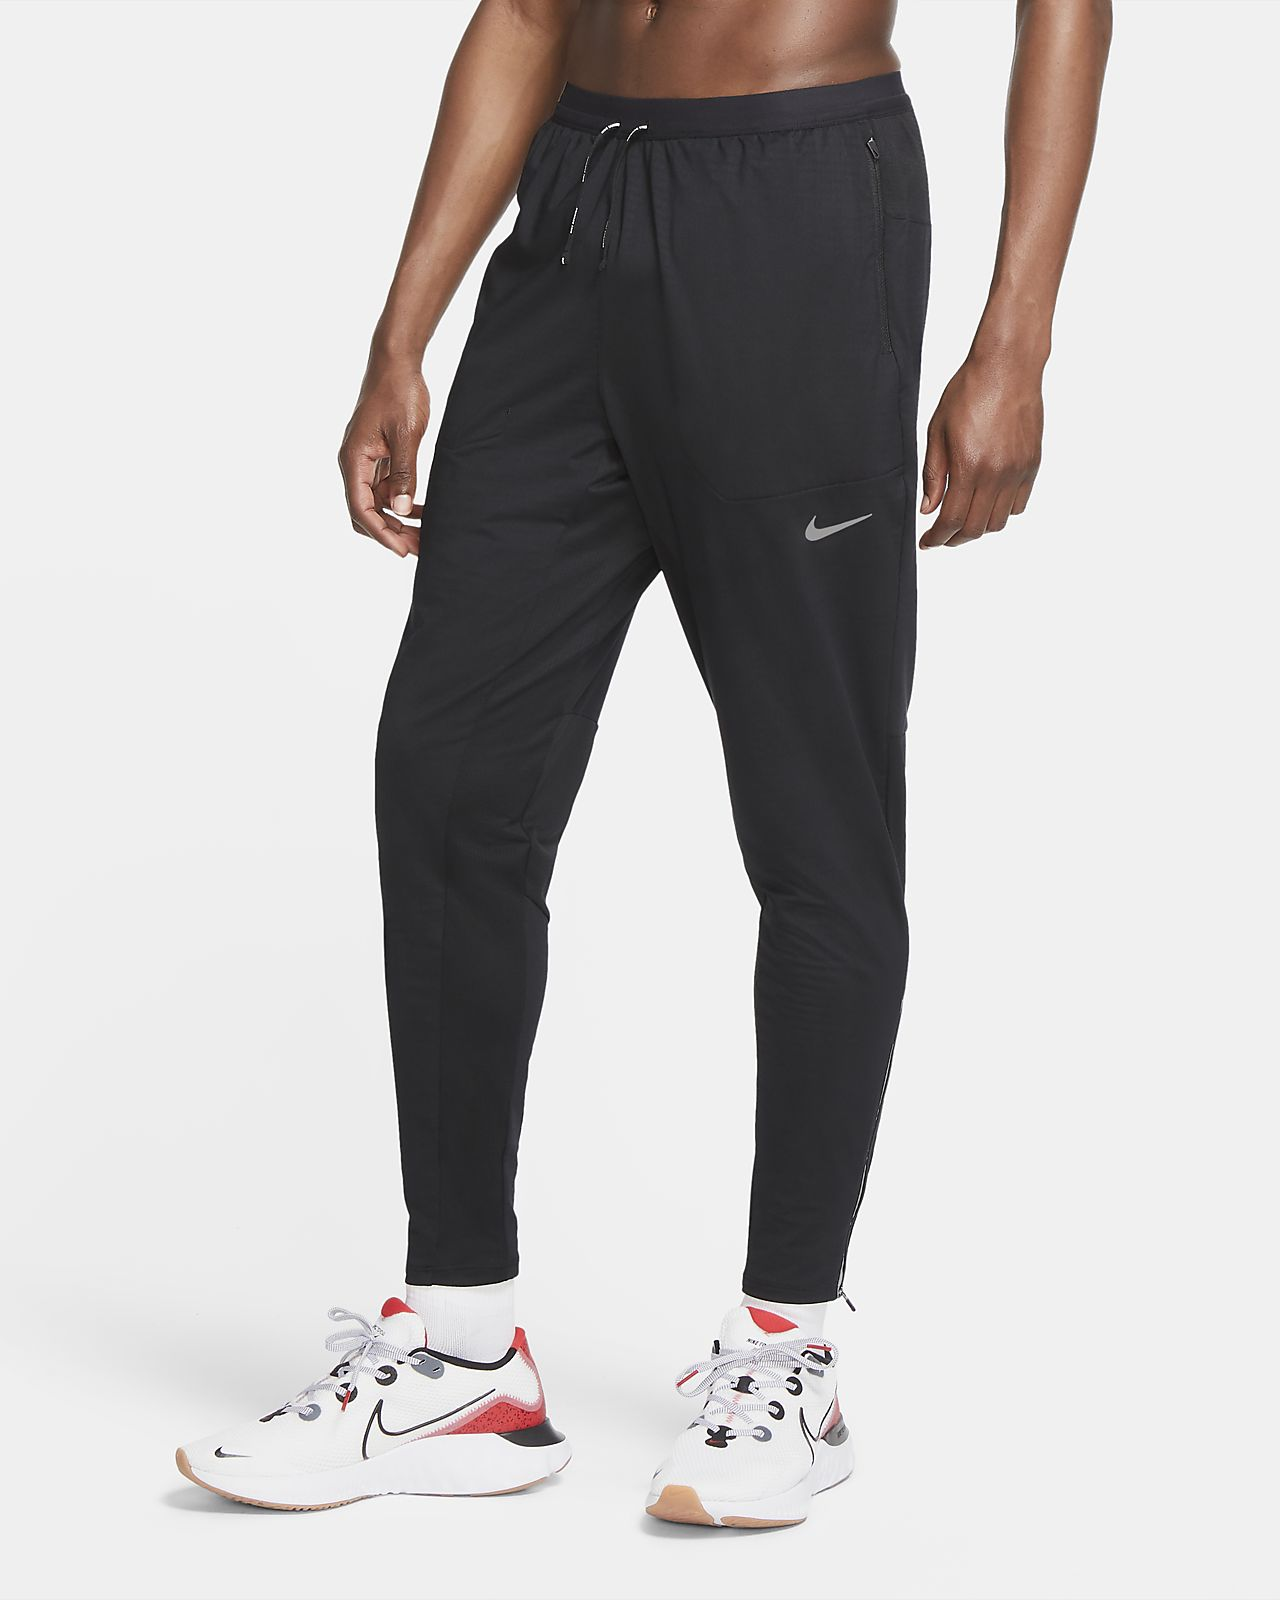 Pánské pleteninové běžecké kalhoty Nike Phenom Elite